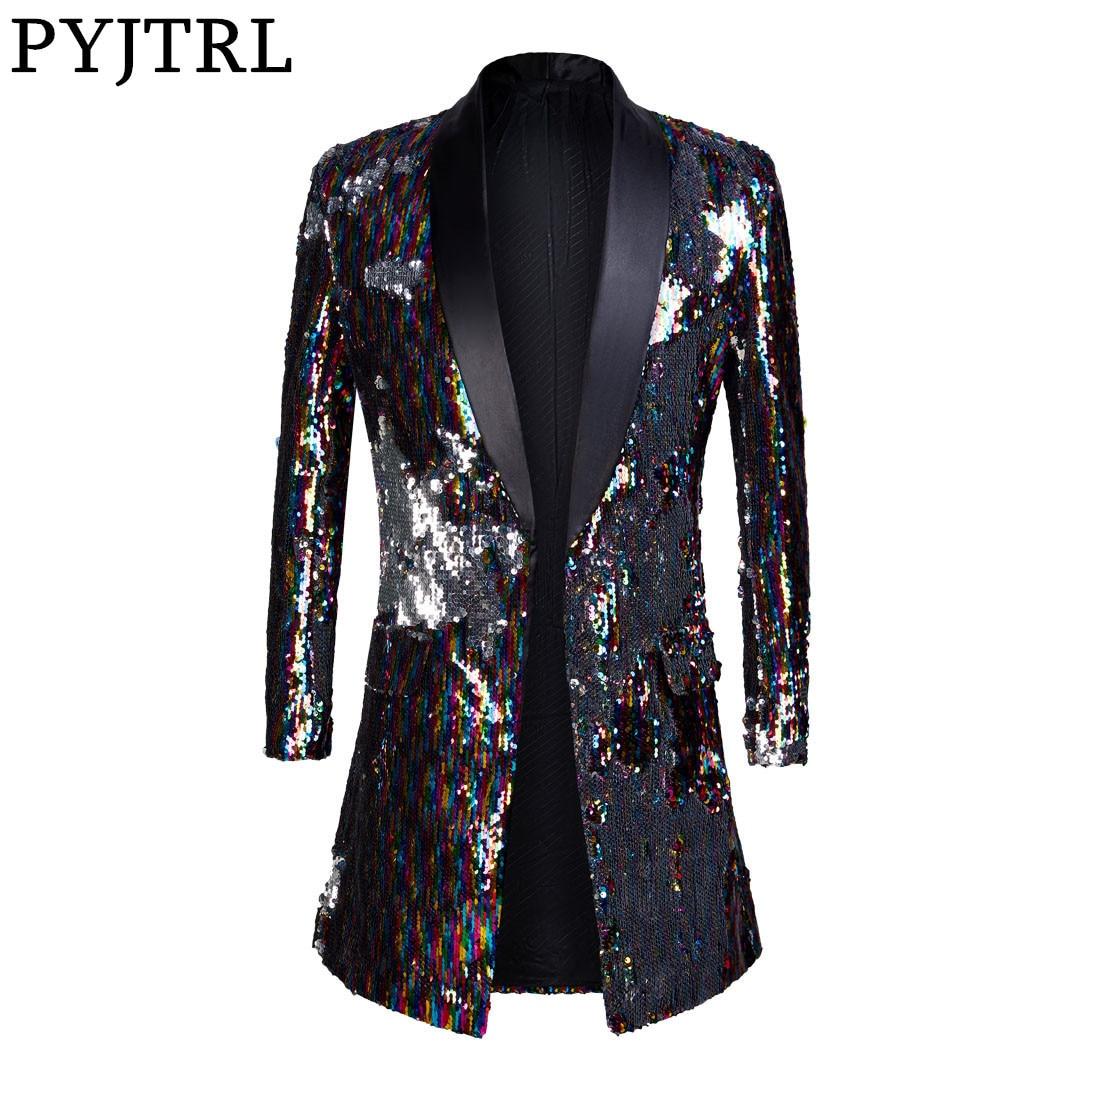 PYJTRL Male Fashion Shawl Lapel Double-sided Colorful Sequins Long Suits Jacket Blazer Masculino Slim Fit Men DJ Singer Costume